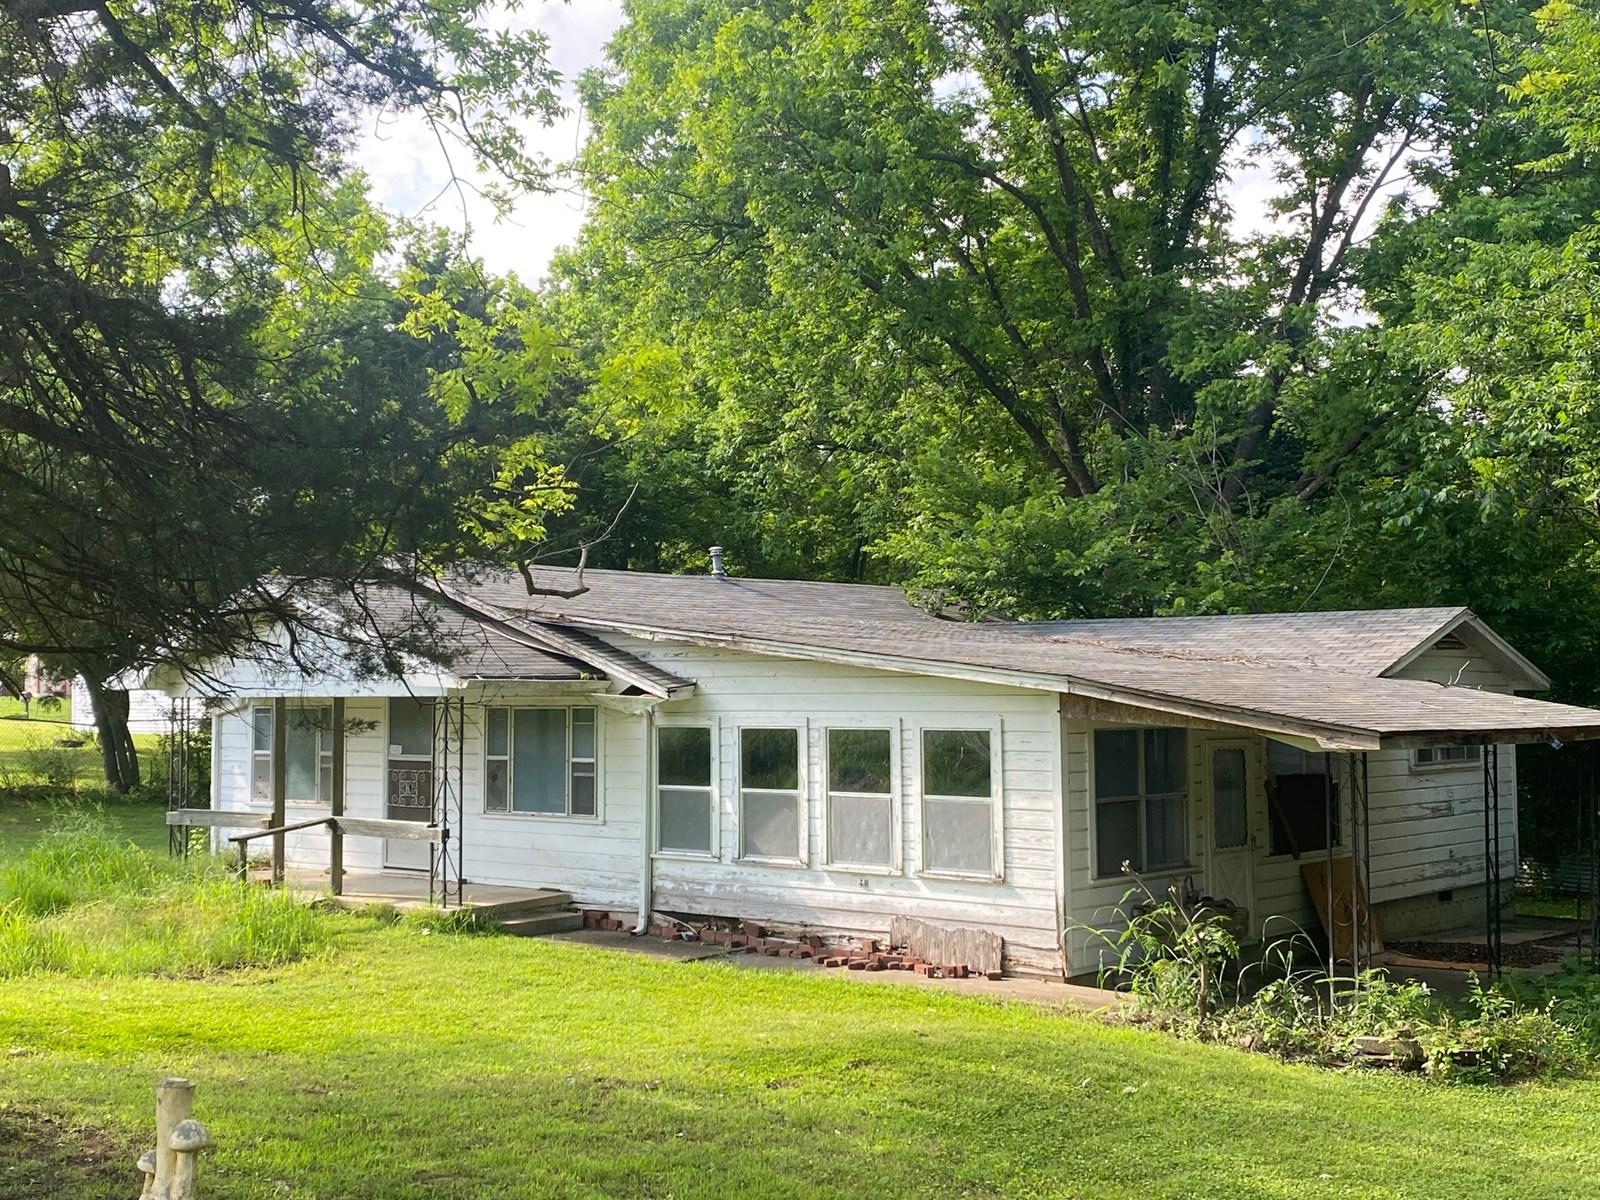 Home for sale Hartshorne, OK